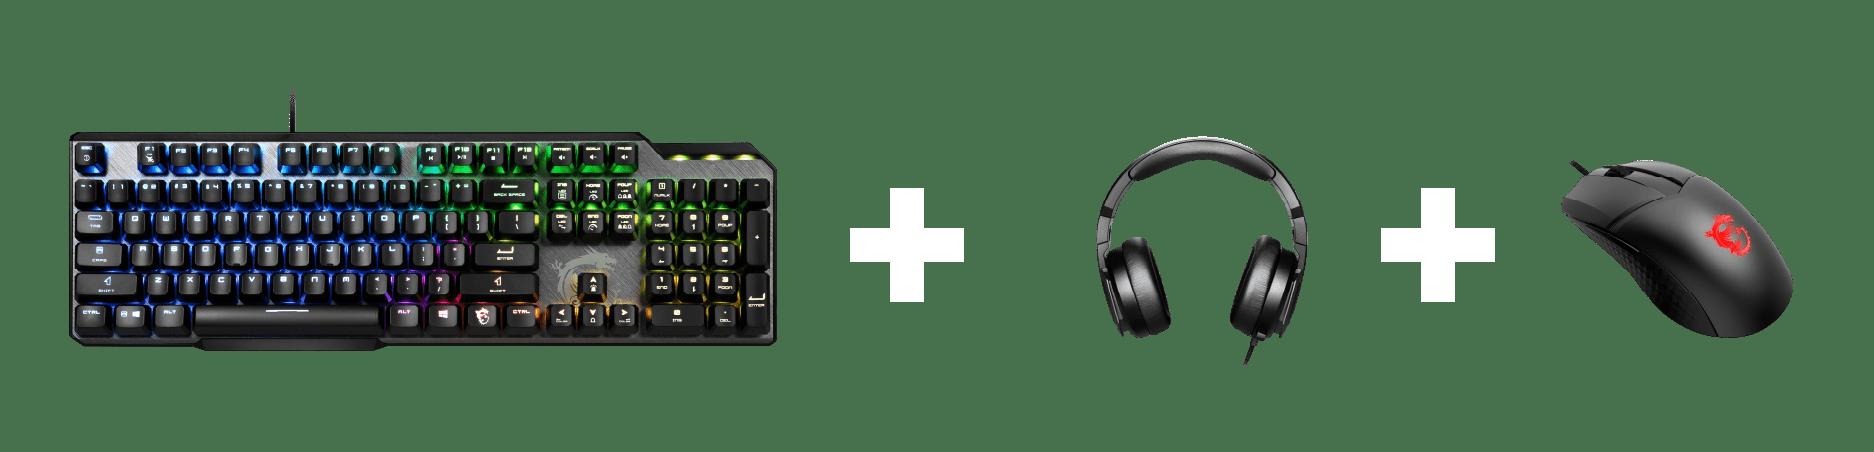 MSI Keyboard + Headset + Mouse